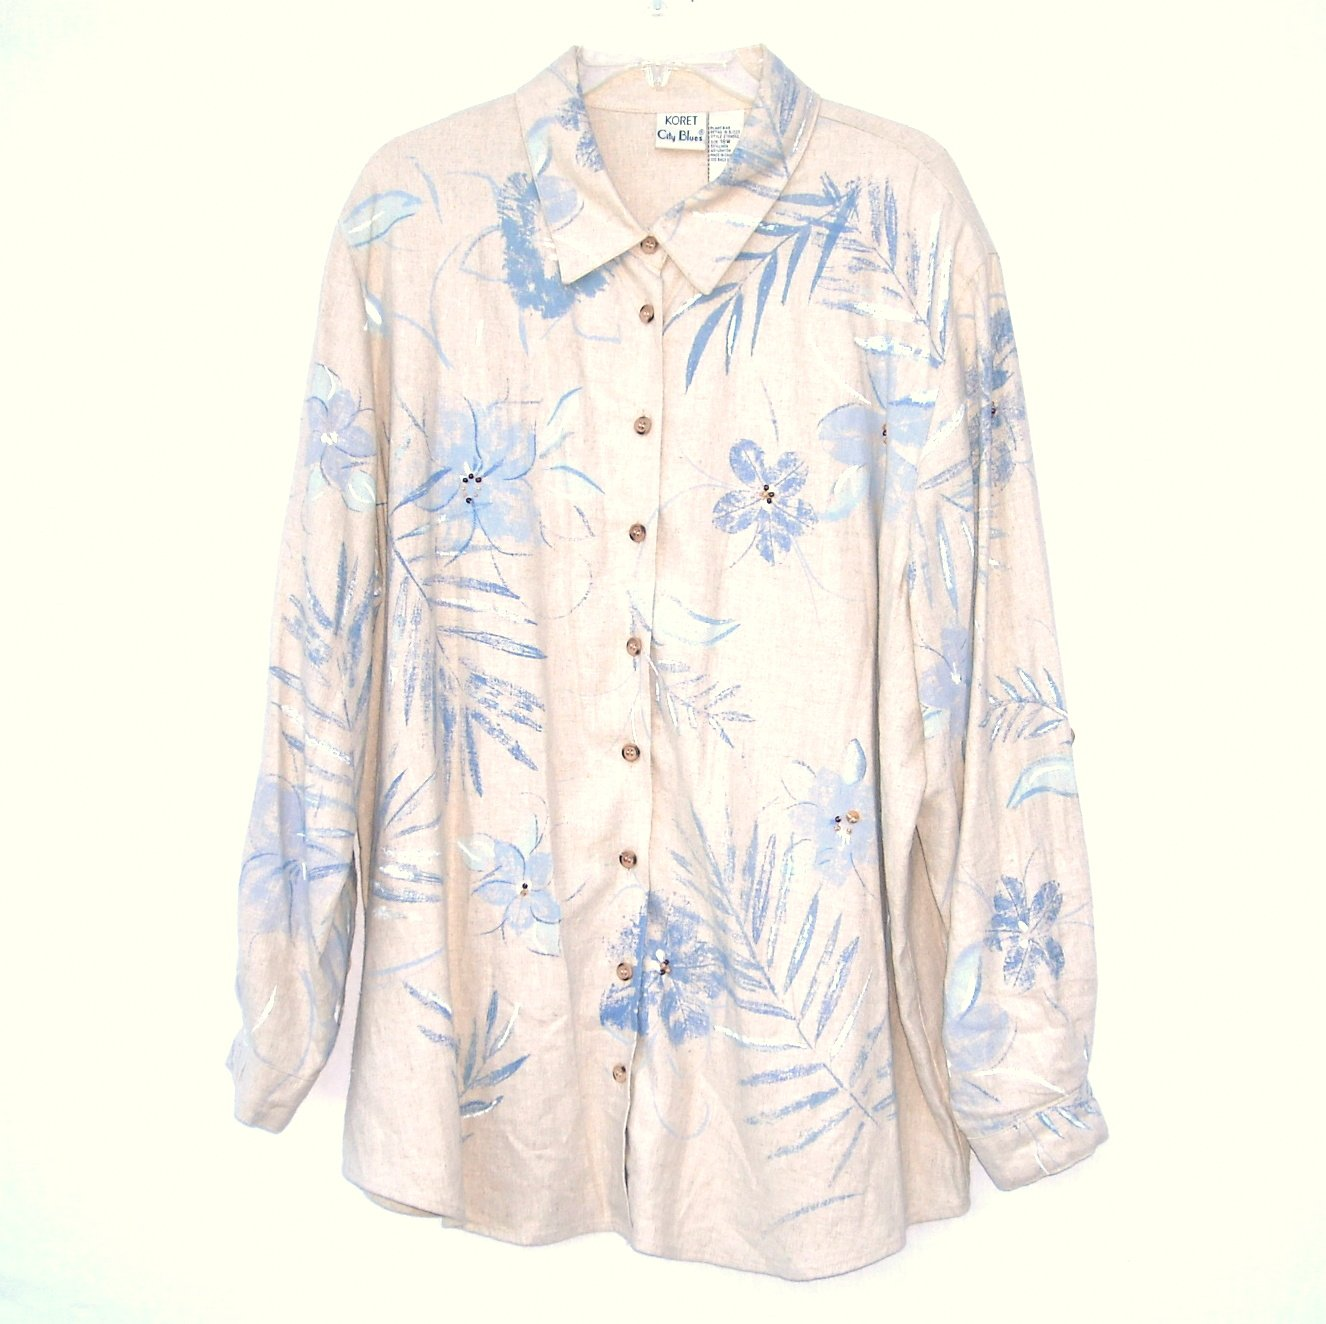 Koret City Blues Womens Soft Long Blouse Shirt Size 18 W